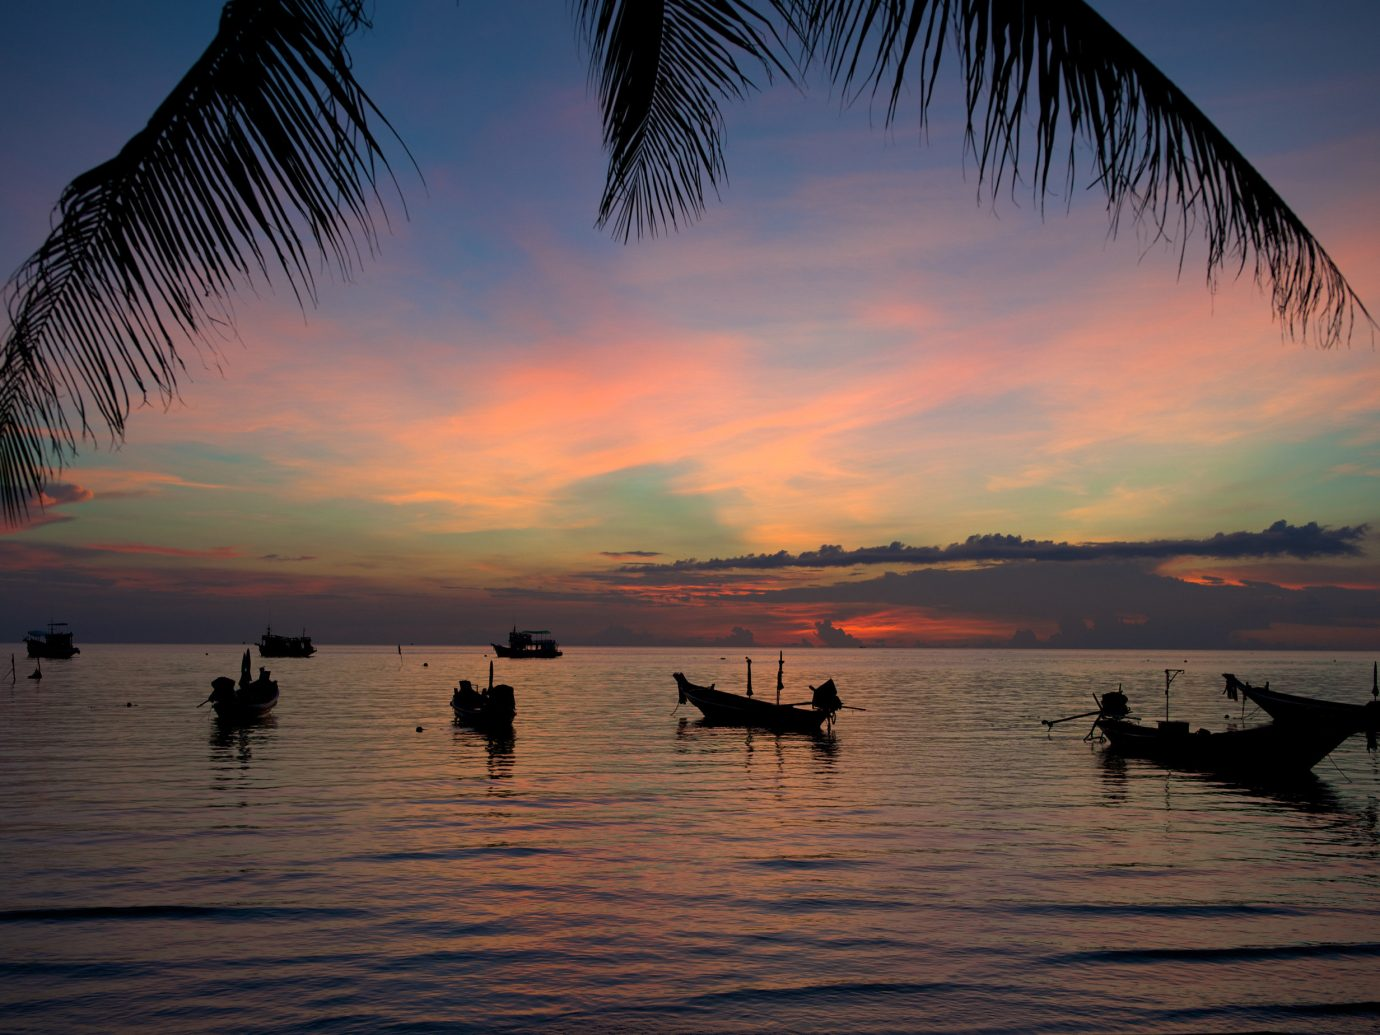 Jetsetter Guides water outdoor sky Sunset horizon sunrise tree reflection Sea dawn dusk cloud evening Ocean morning afterglow shore sunlight palm wave plant Beach